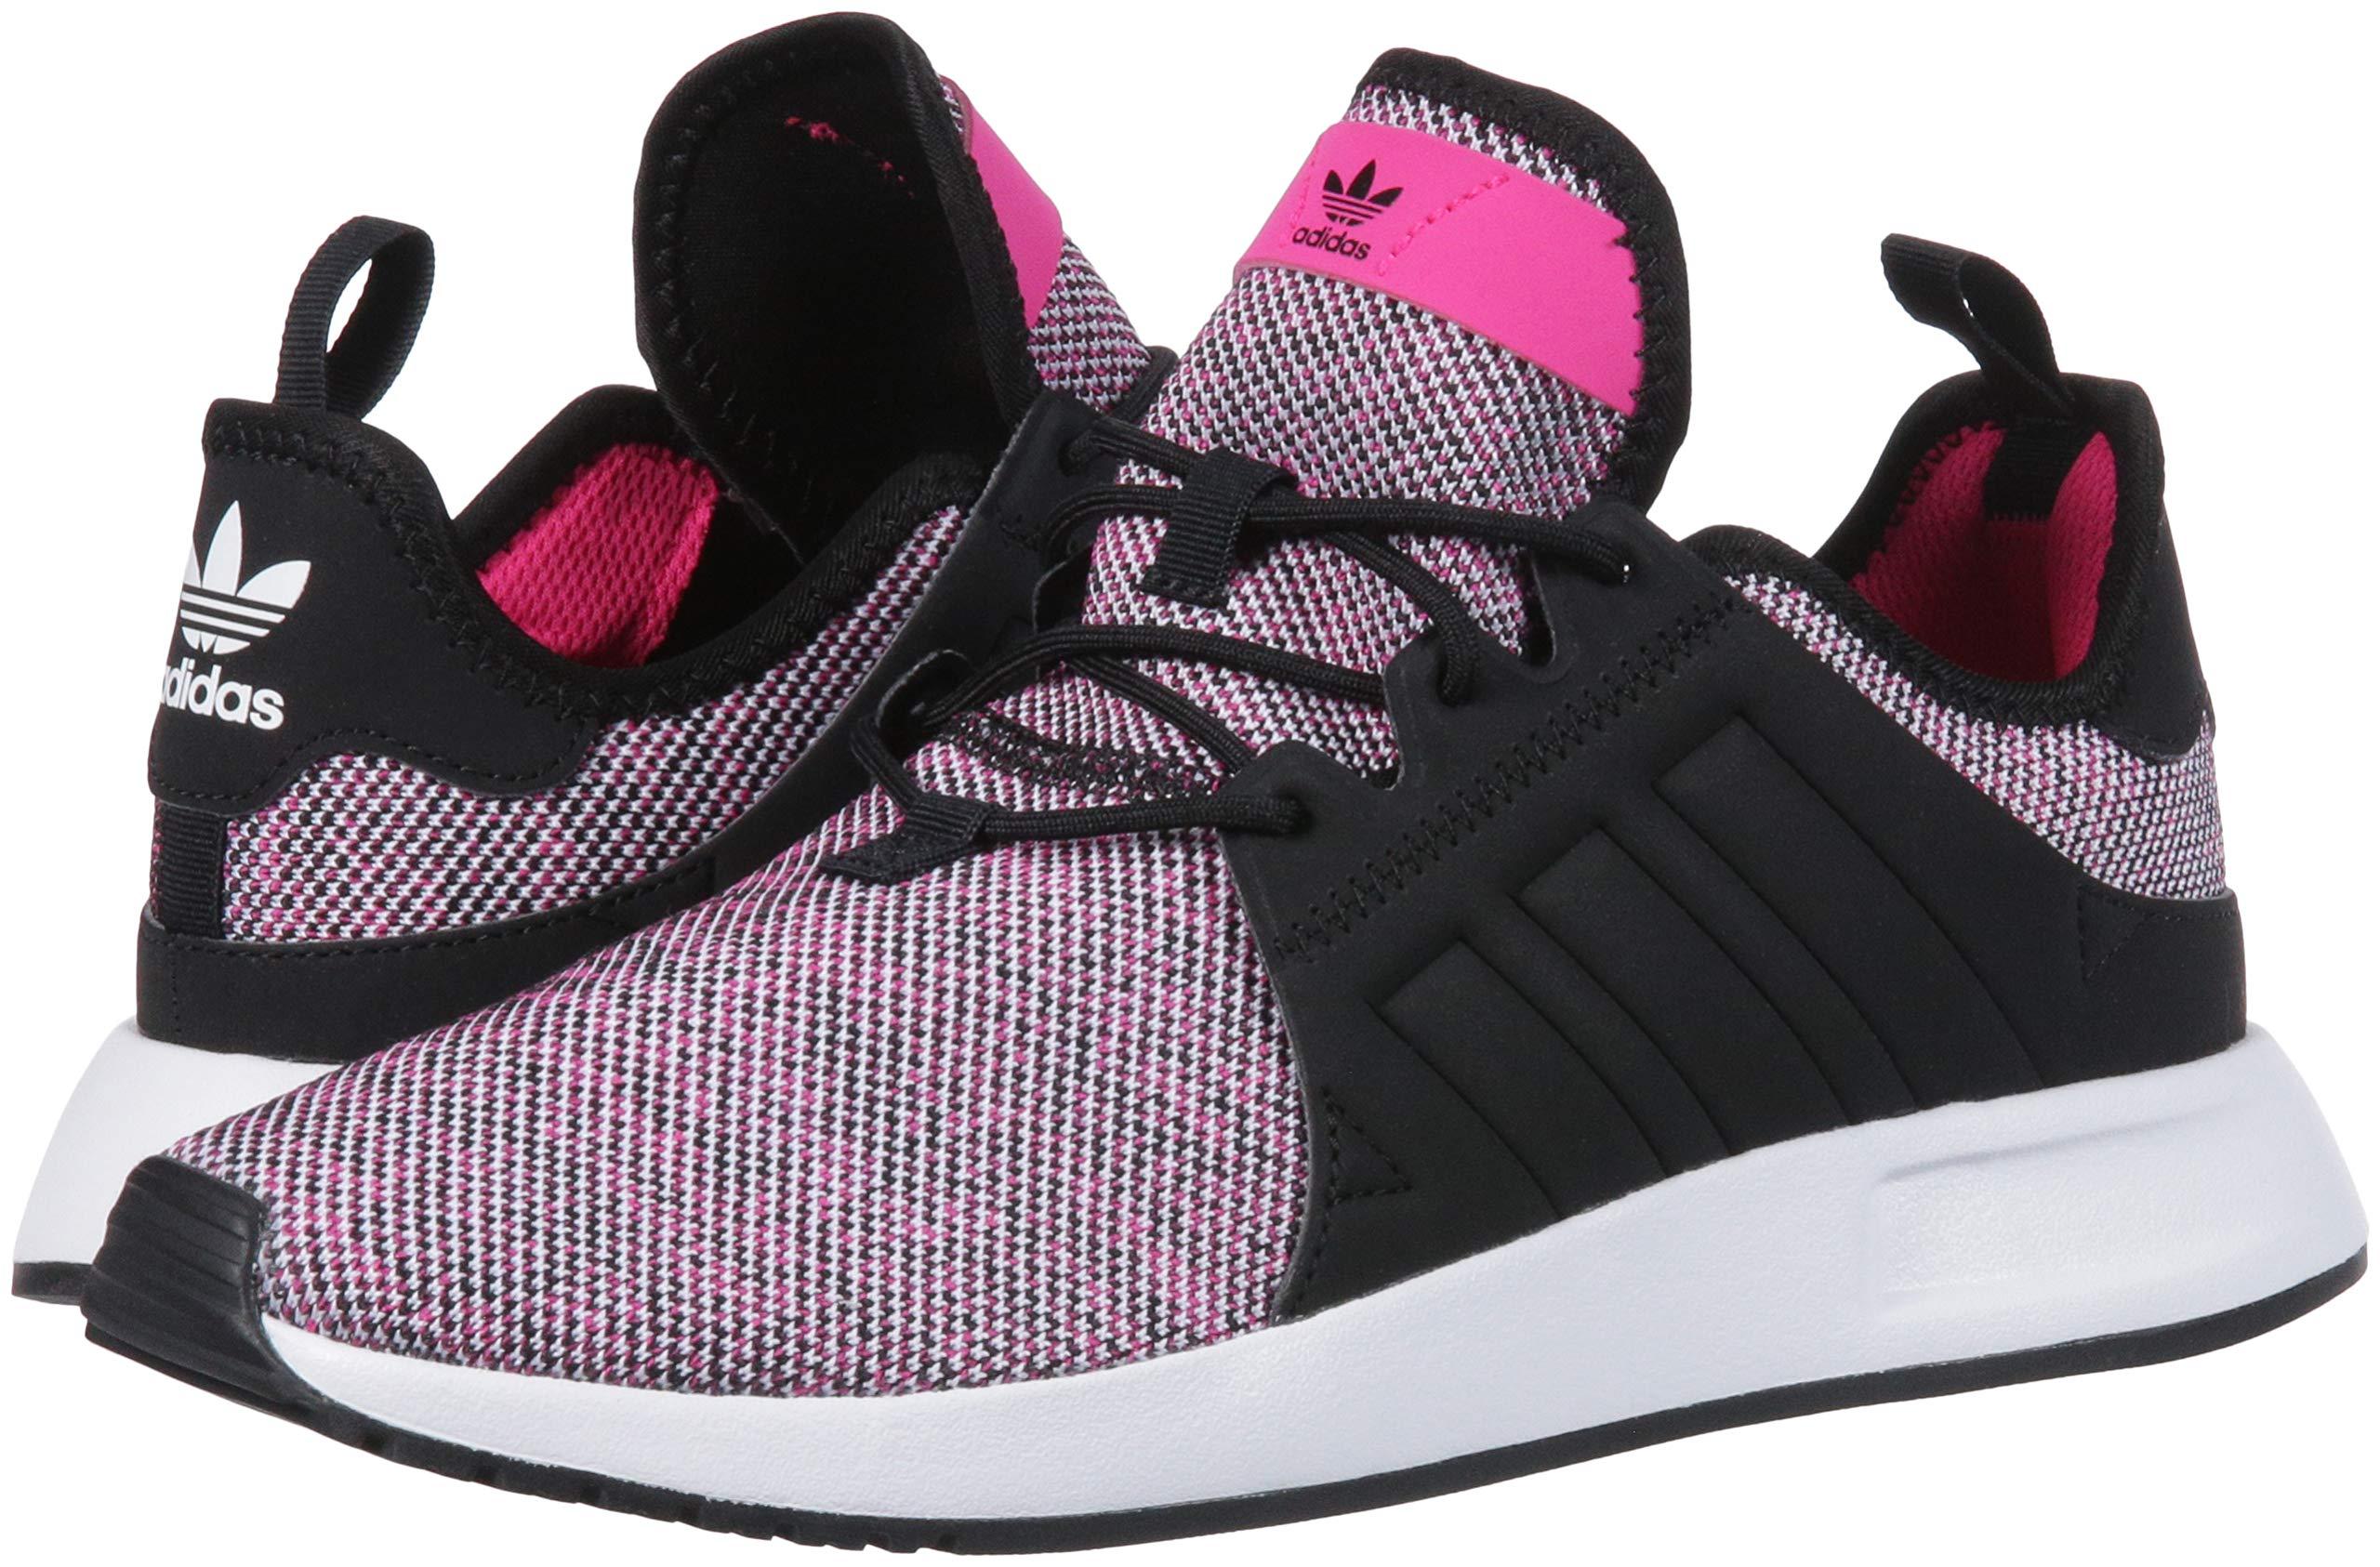 adidas Originals Unisex X_PLR Running Shoe, Shock Pink/Black/White, 3.5 M US Big Kid by adidas Originals (Image #6)